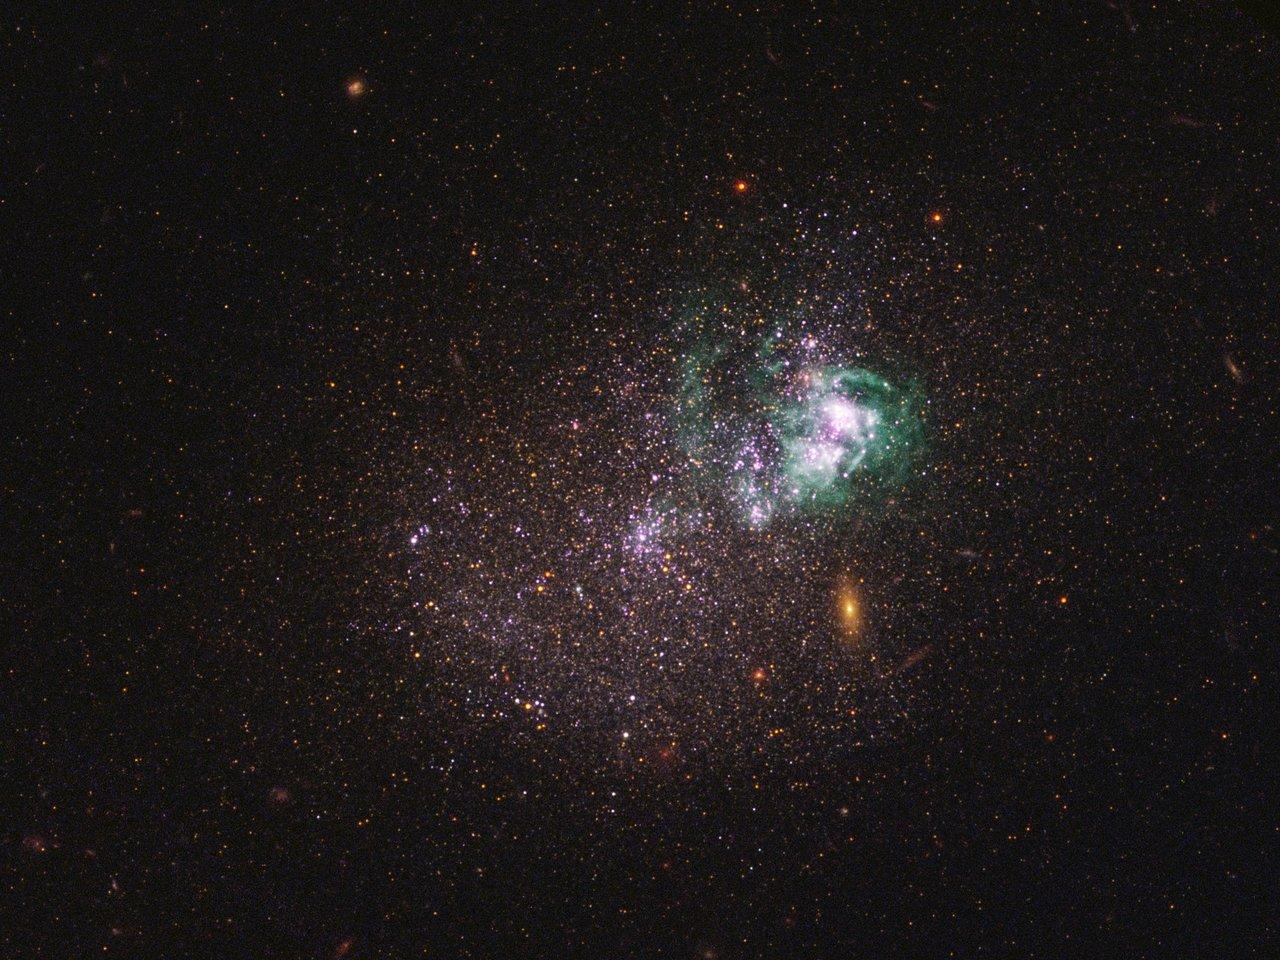 Galáxia anã